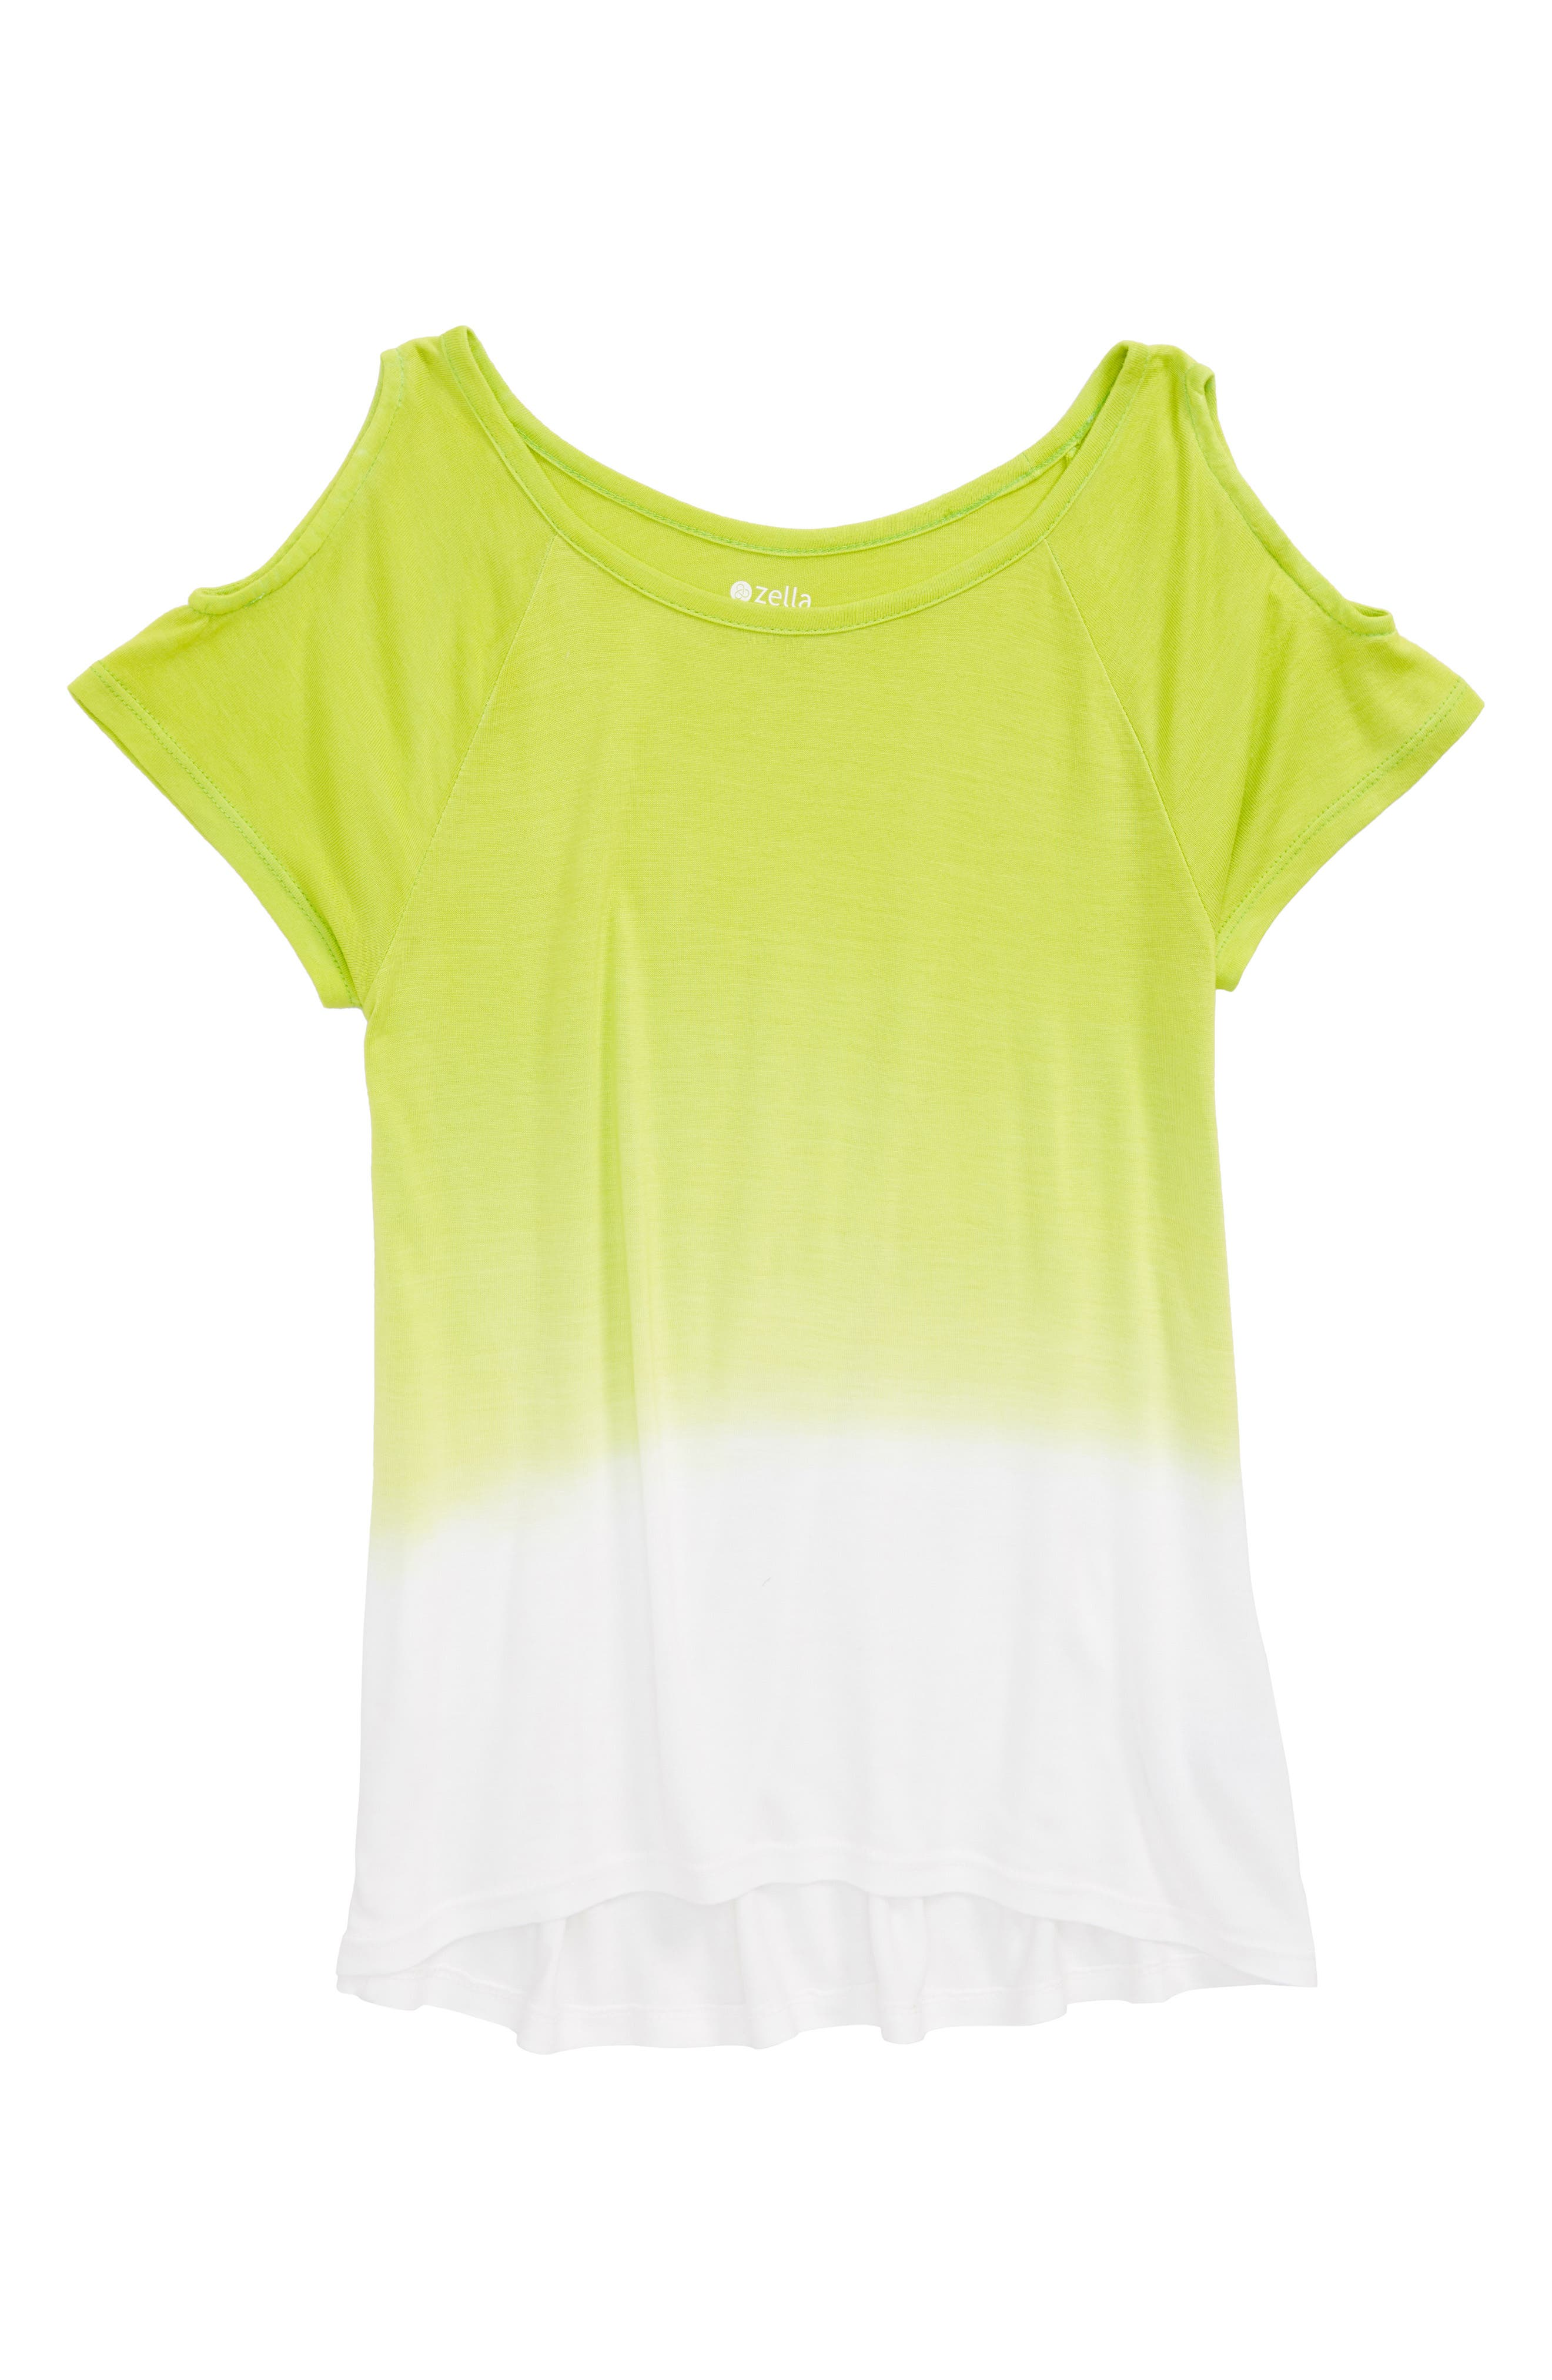 Dip Dye Cold Shoulder Tee,                             Main thumbnail 1, color,                             Green Sulphur- White Ombre